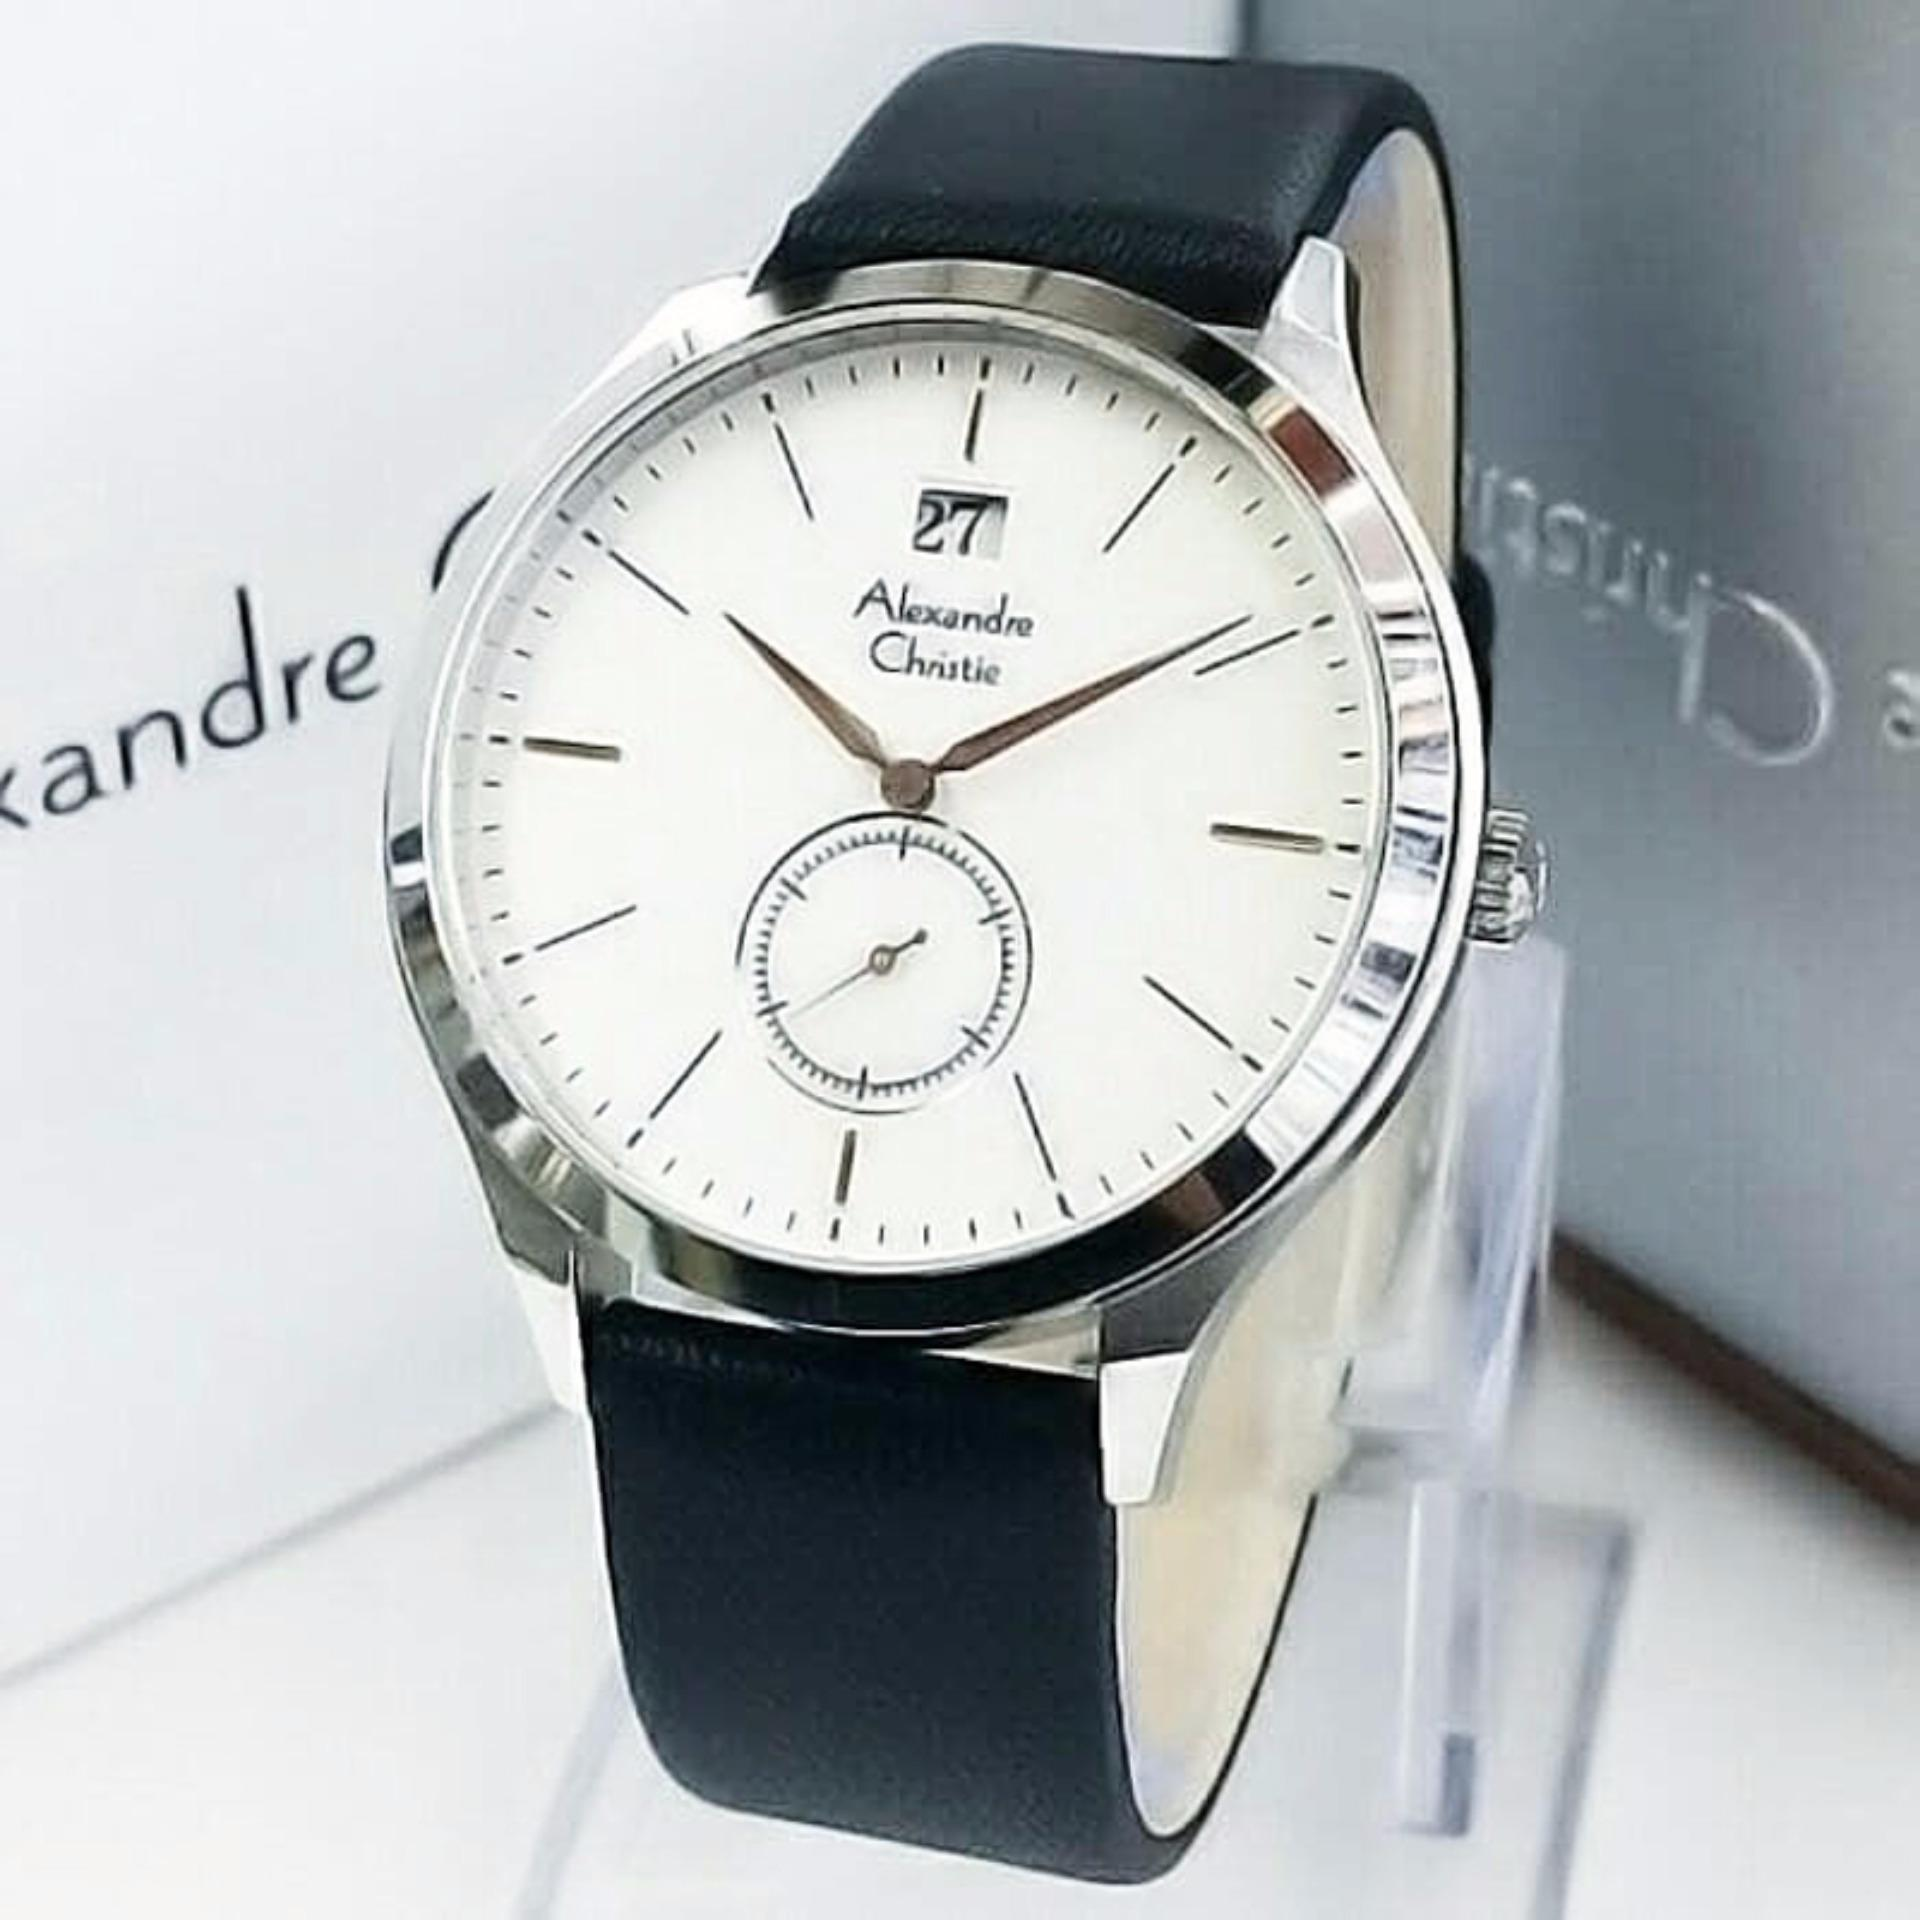 Alexandre Christie Jam Tangan Pria Rosegold Putih Strap Hitam 8471 6324 Silver Original Ac8440s Kulit